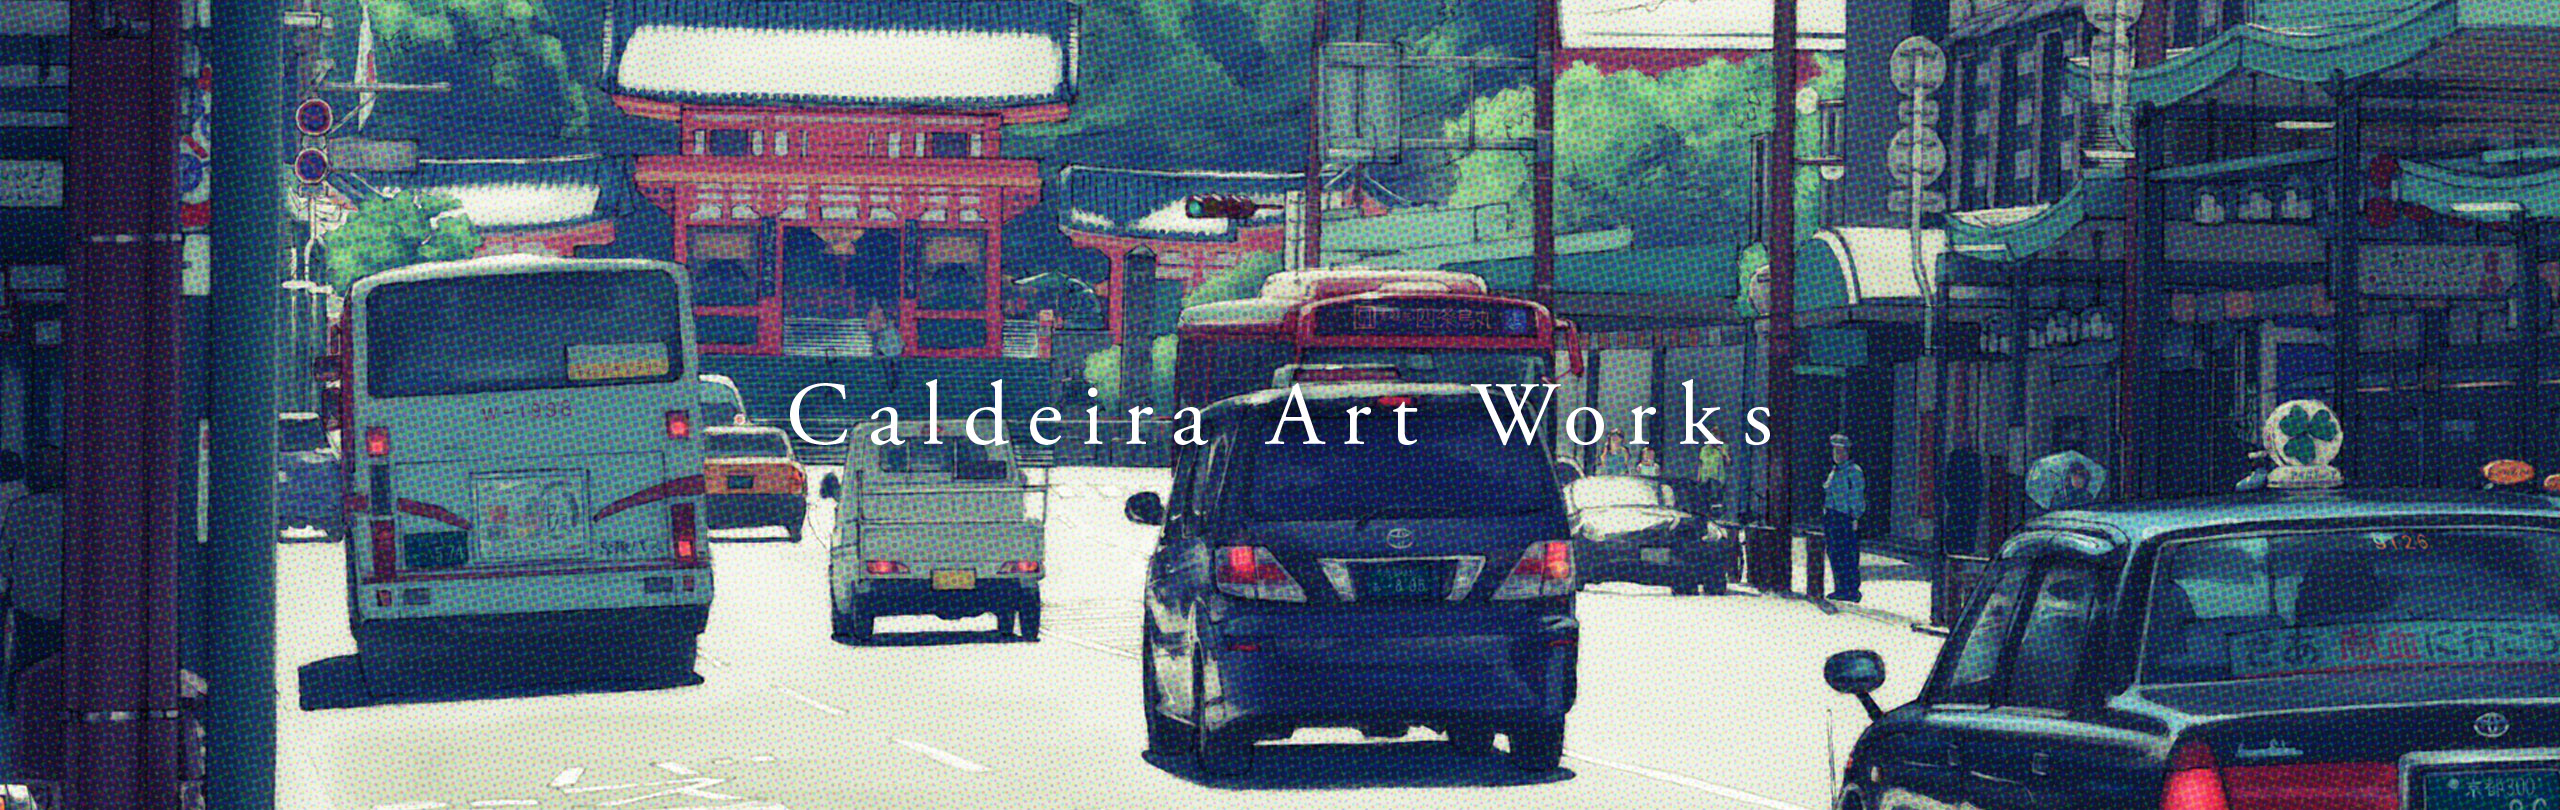 Caldeira Art Works